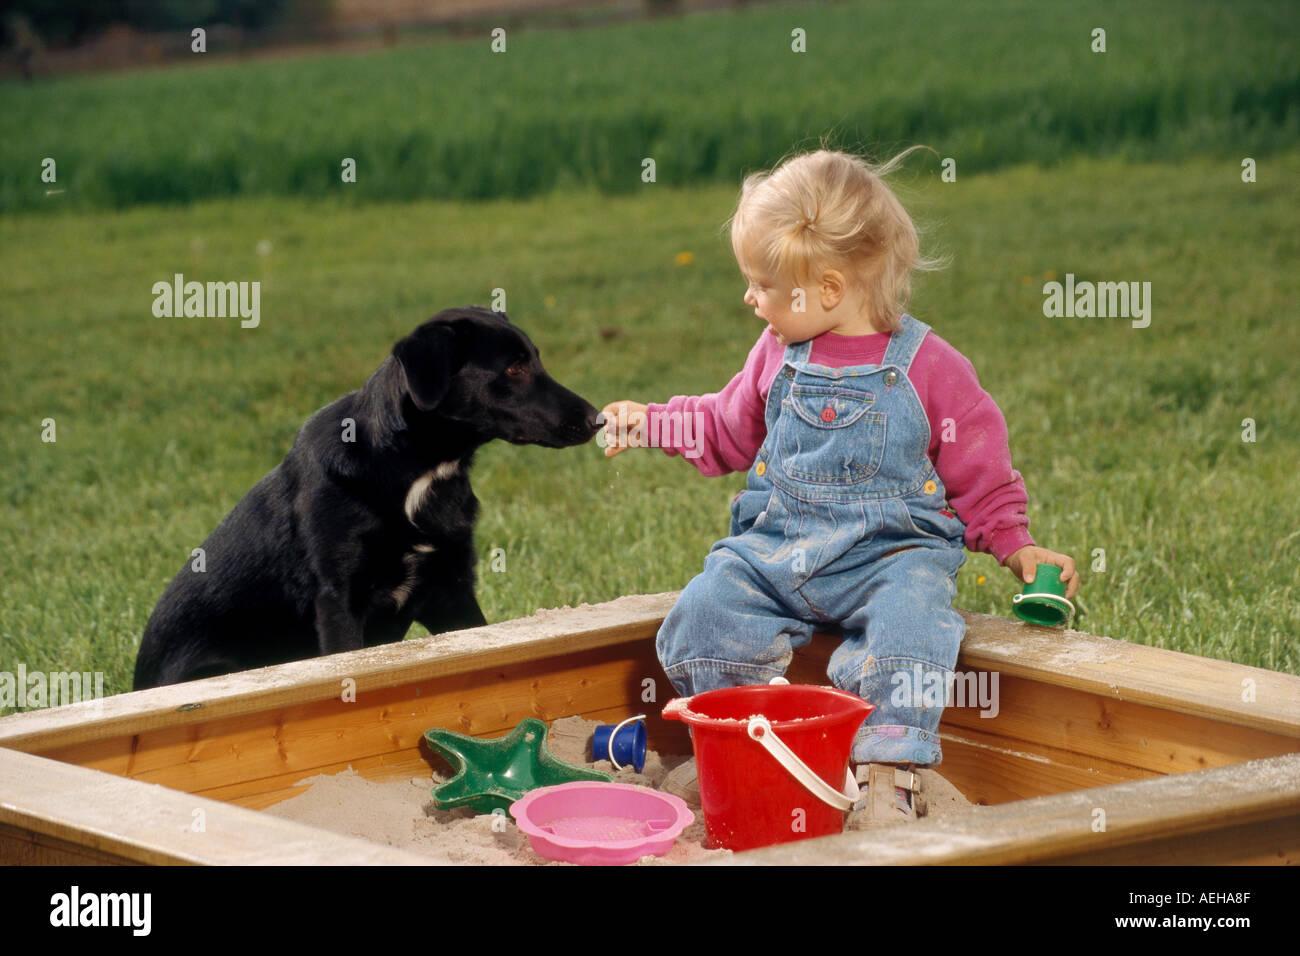 hybrid dog beside infant at sandbox - Stock Image